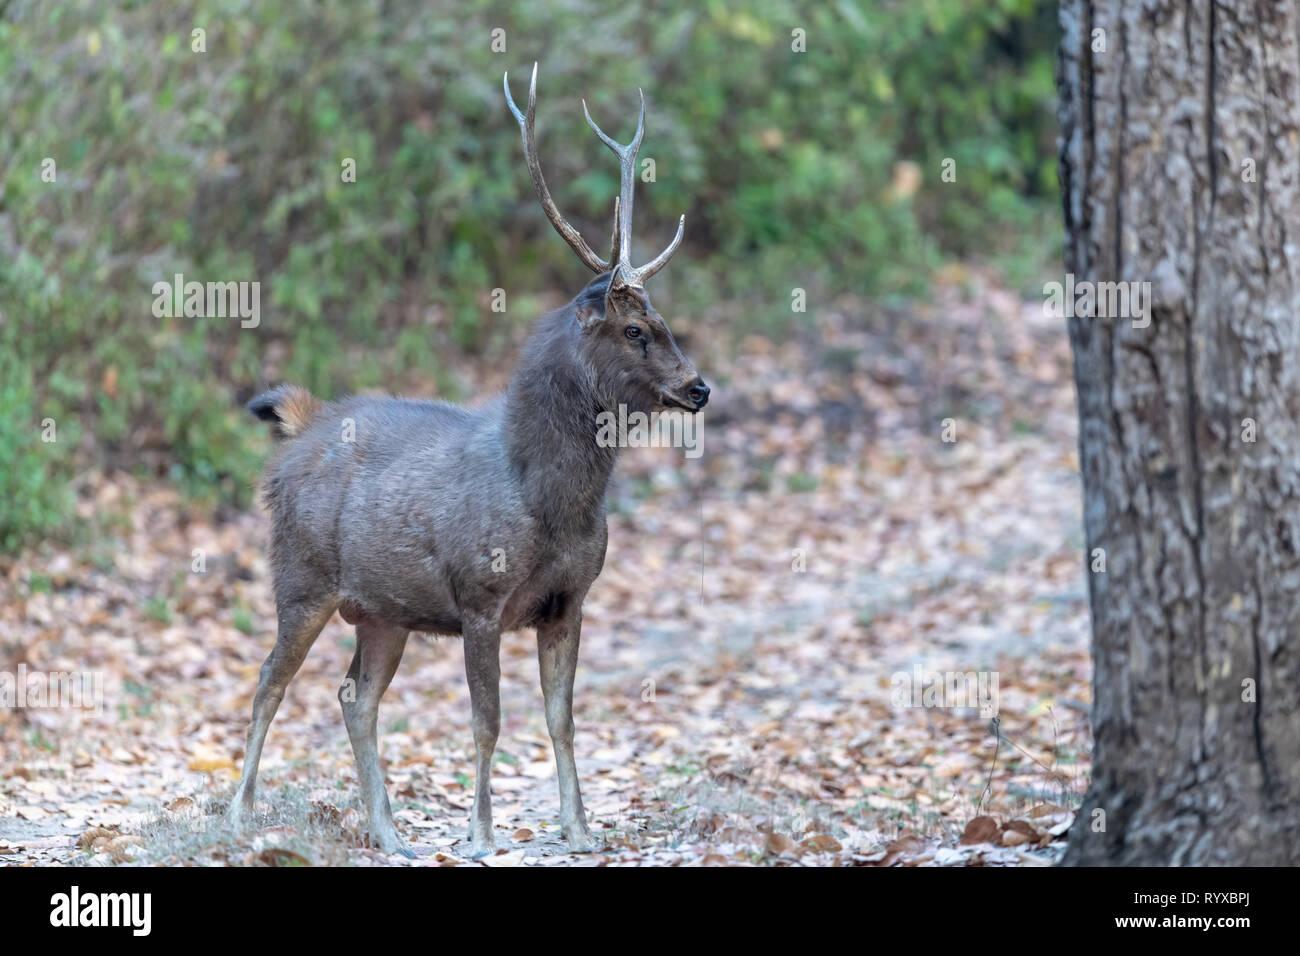 Vulnerabili-elencati Indian sambar deer (Rusa unicolor unicolor) in India Immagini Stock